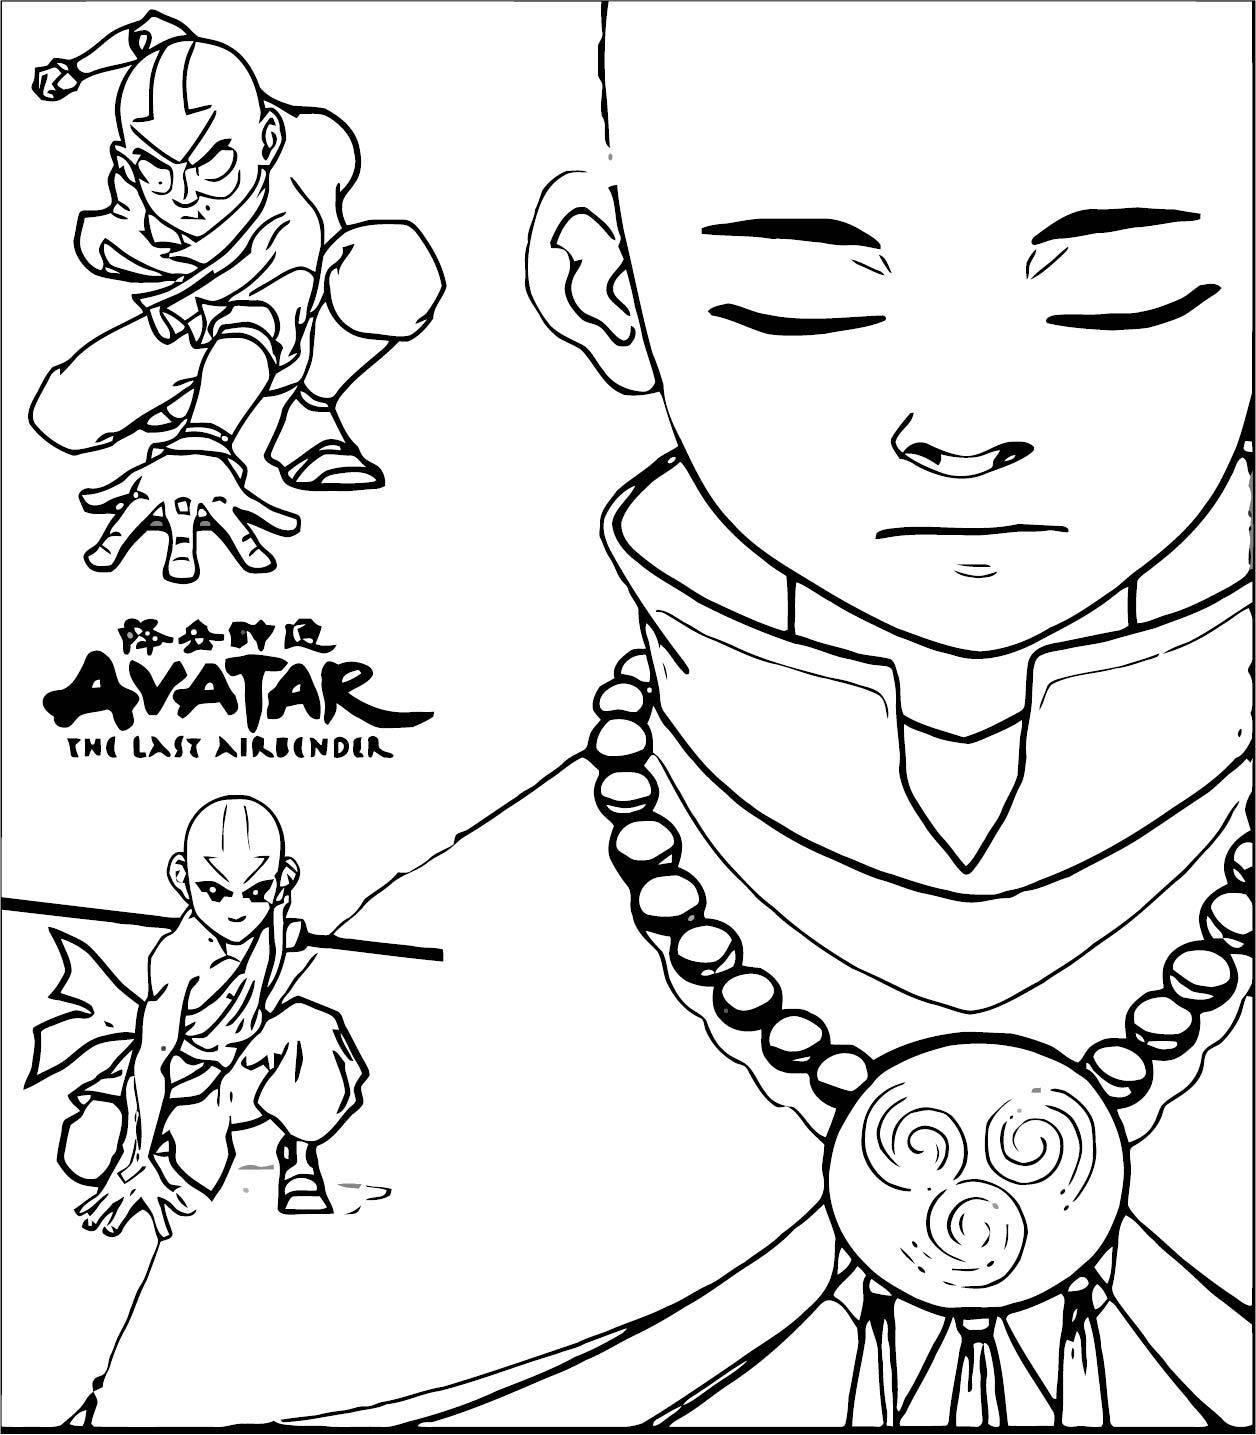 Avatar Aang Coloring Page: Aang The Last Airbender Becksgirl Dyjzf Avatar Aang